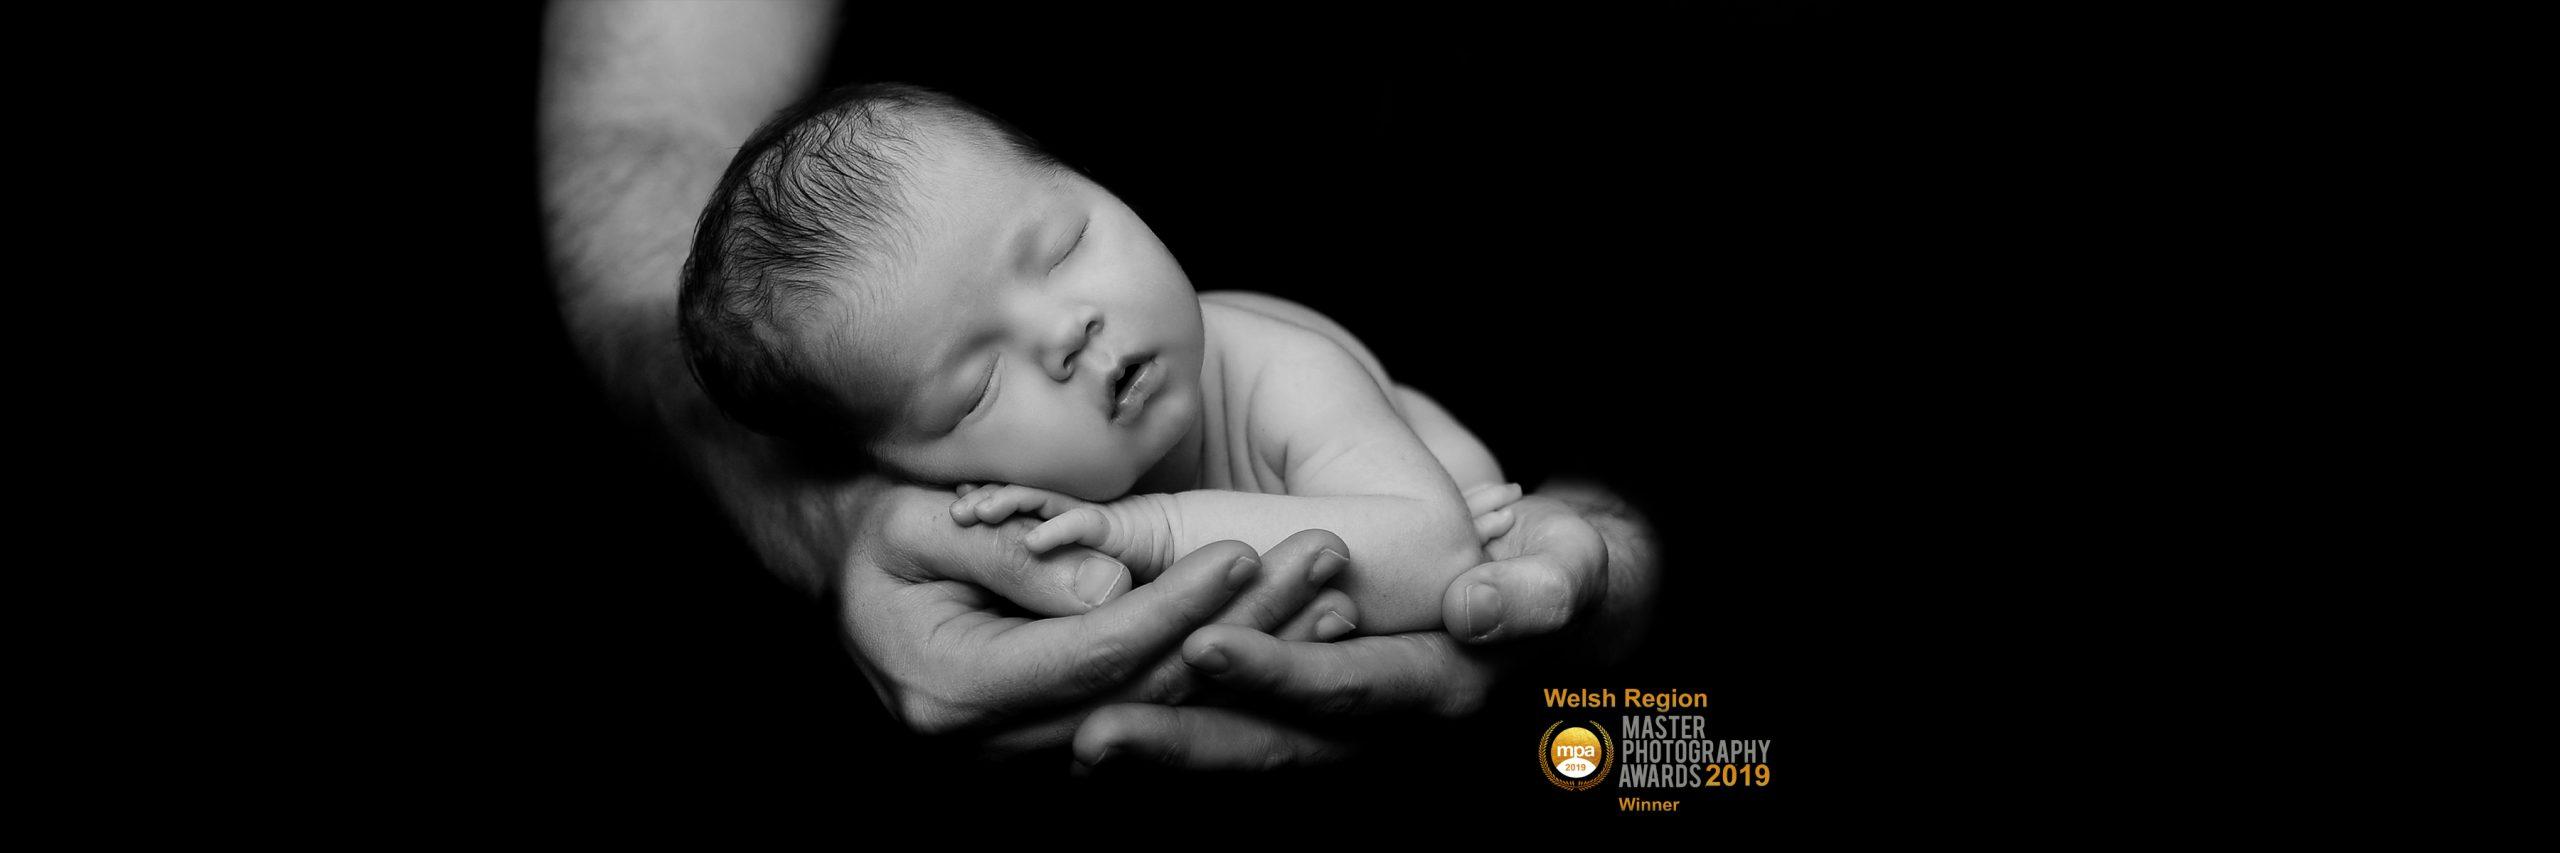 MPA welsh newborn photographer of the year Darren Whiteley